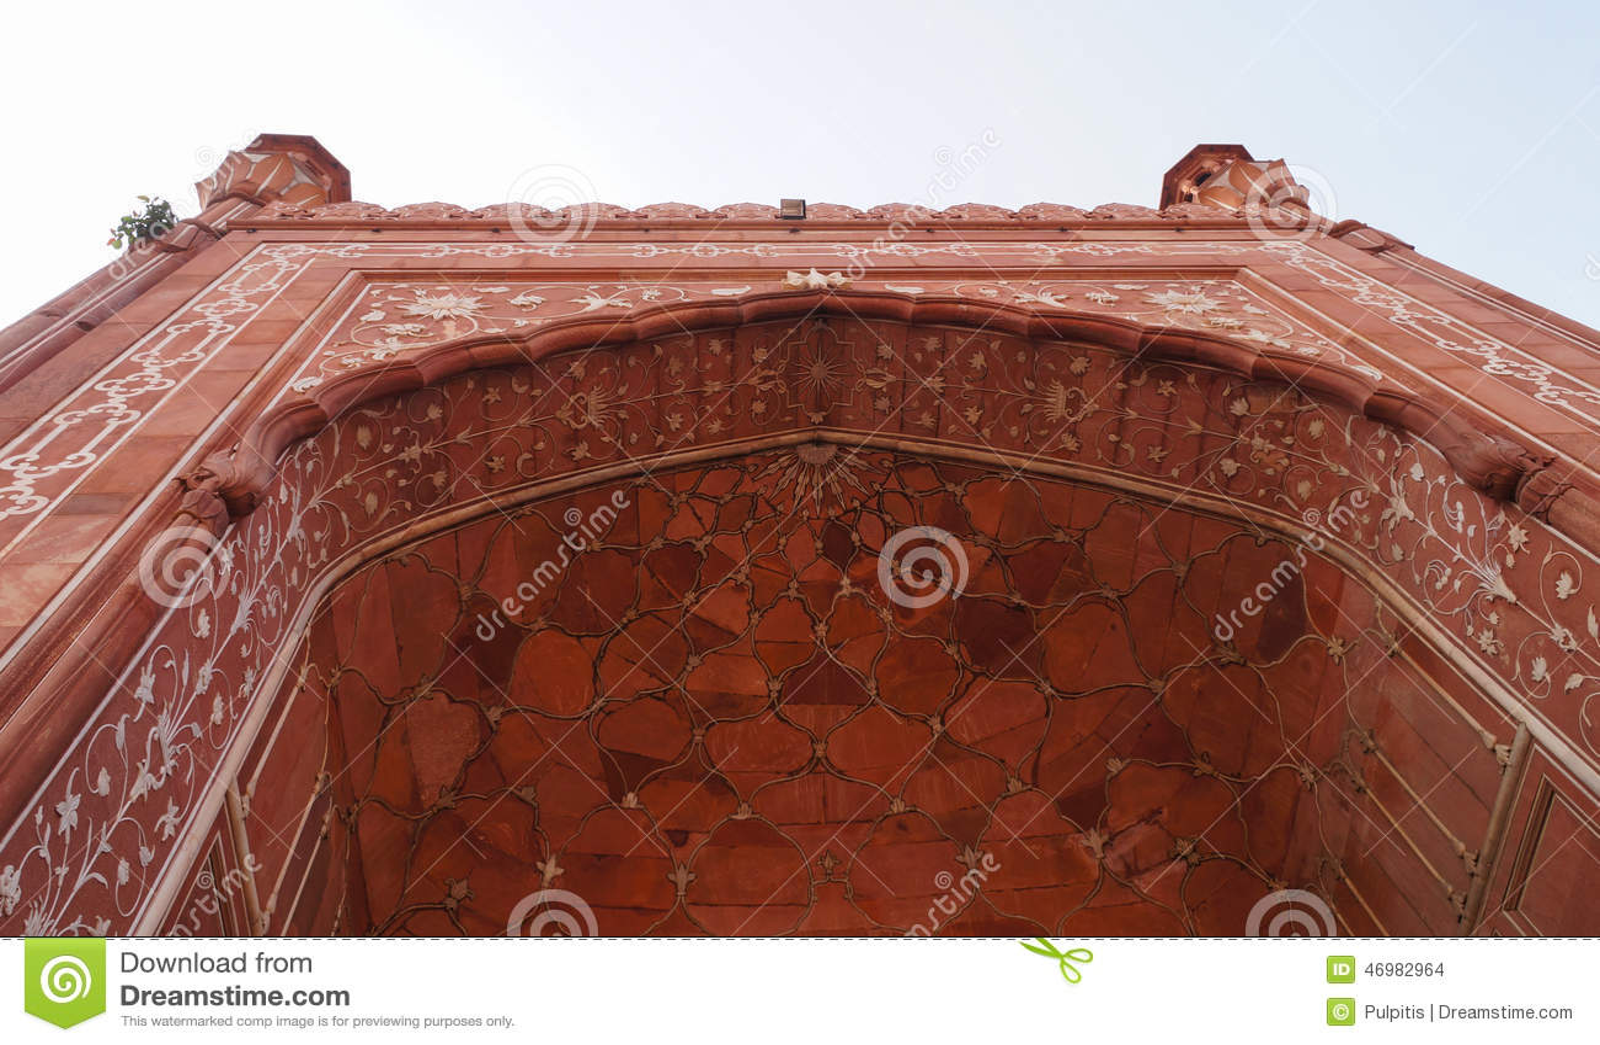 Mosque Detail: Beautiful Detail Of Badshahi Mosque In Lahore,Pakistan